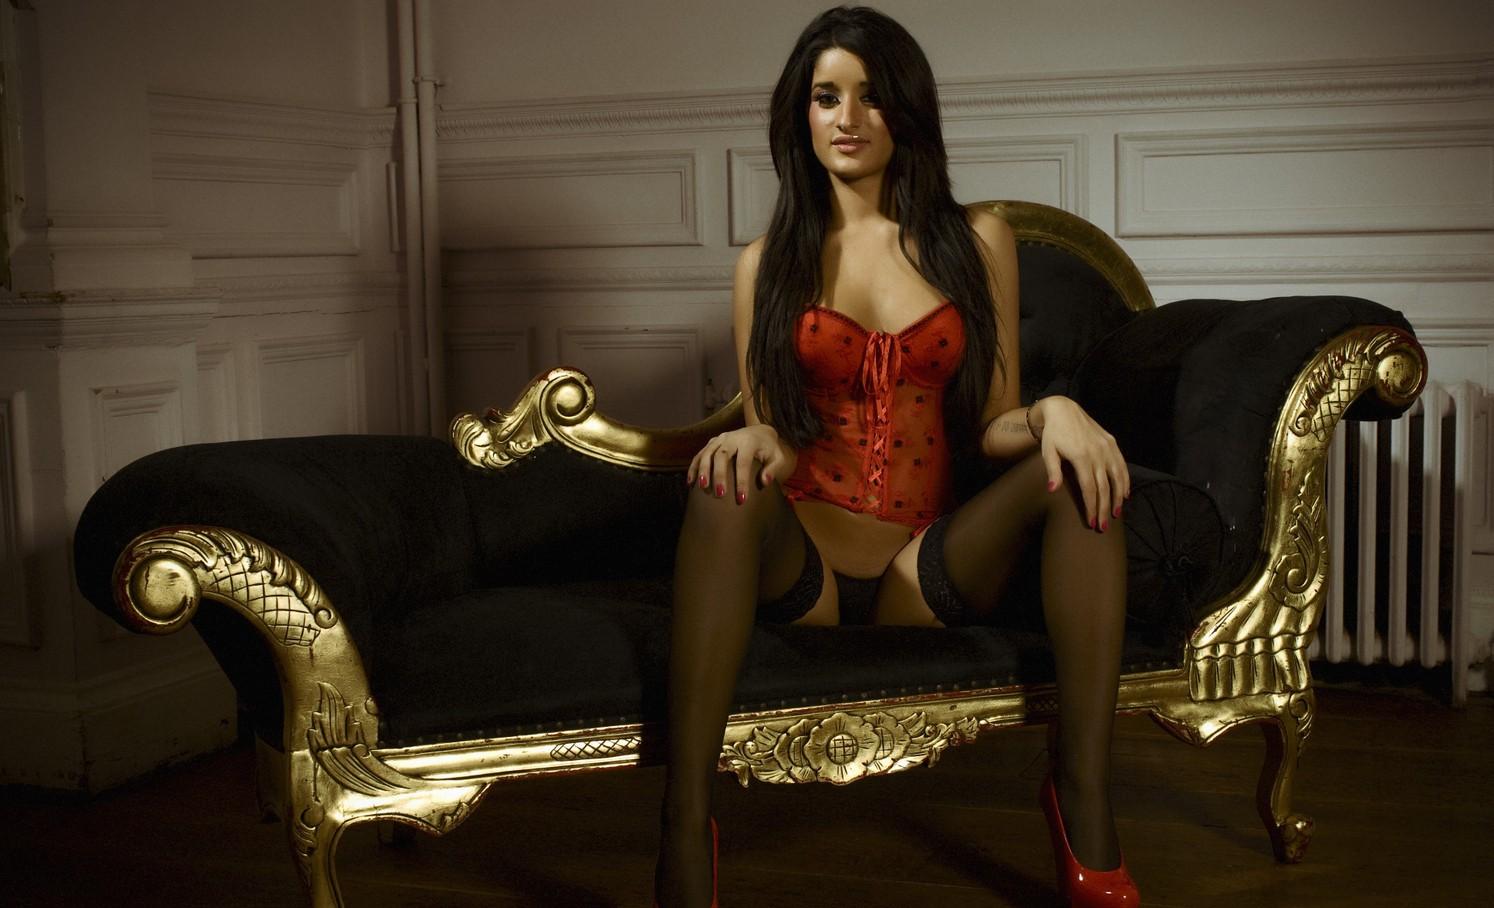 wallpaper : women, sitting, stockings, chair, fashion, clothing